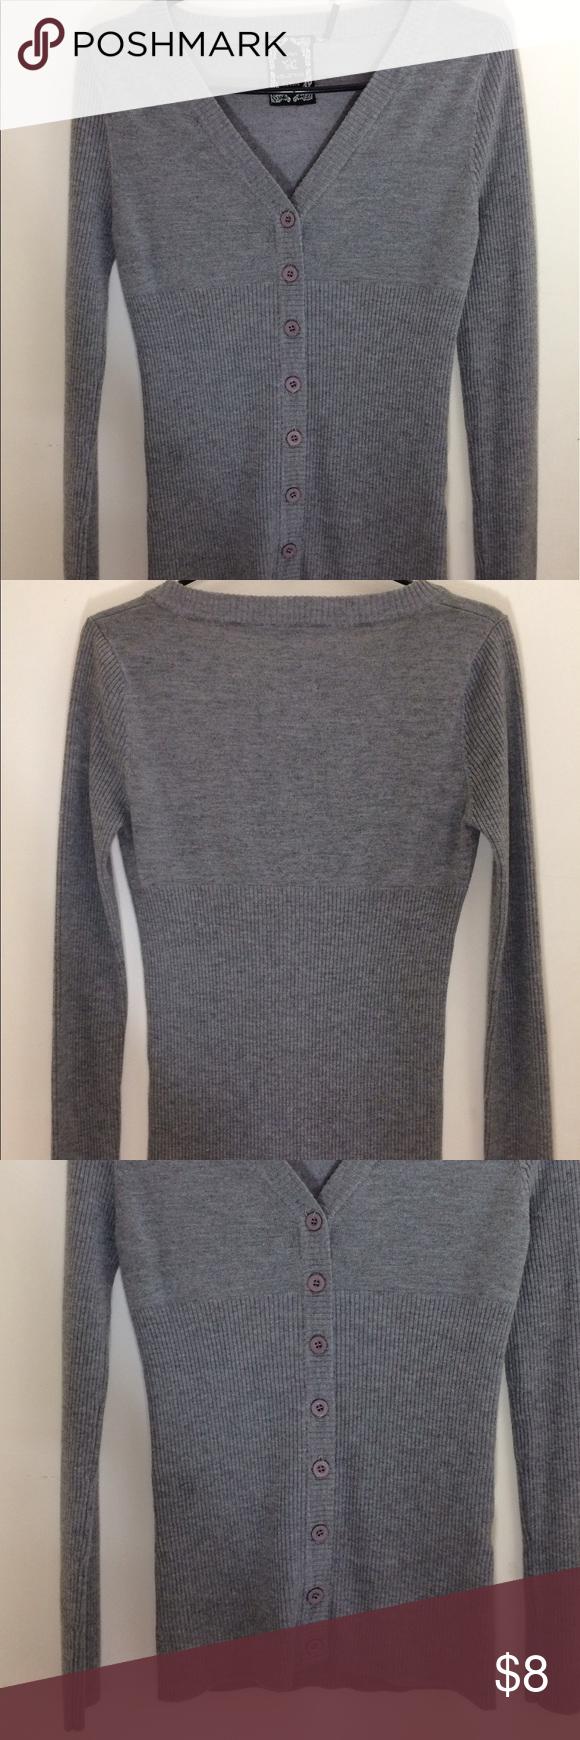 Women Cardigan Sweater | Sweater cardigan, Women's cardigans and ...